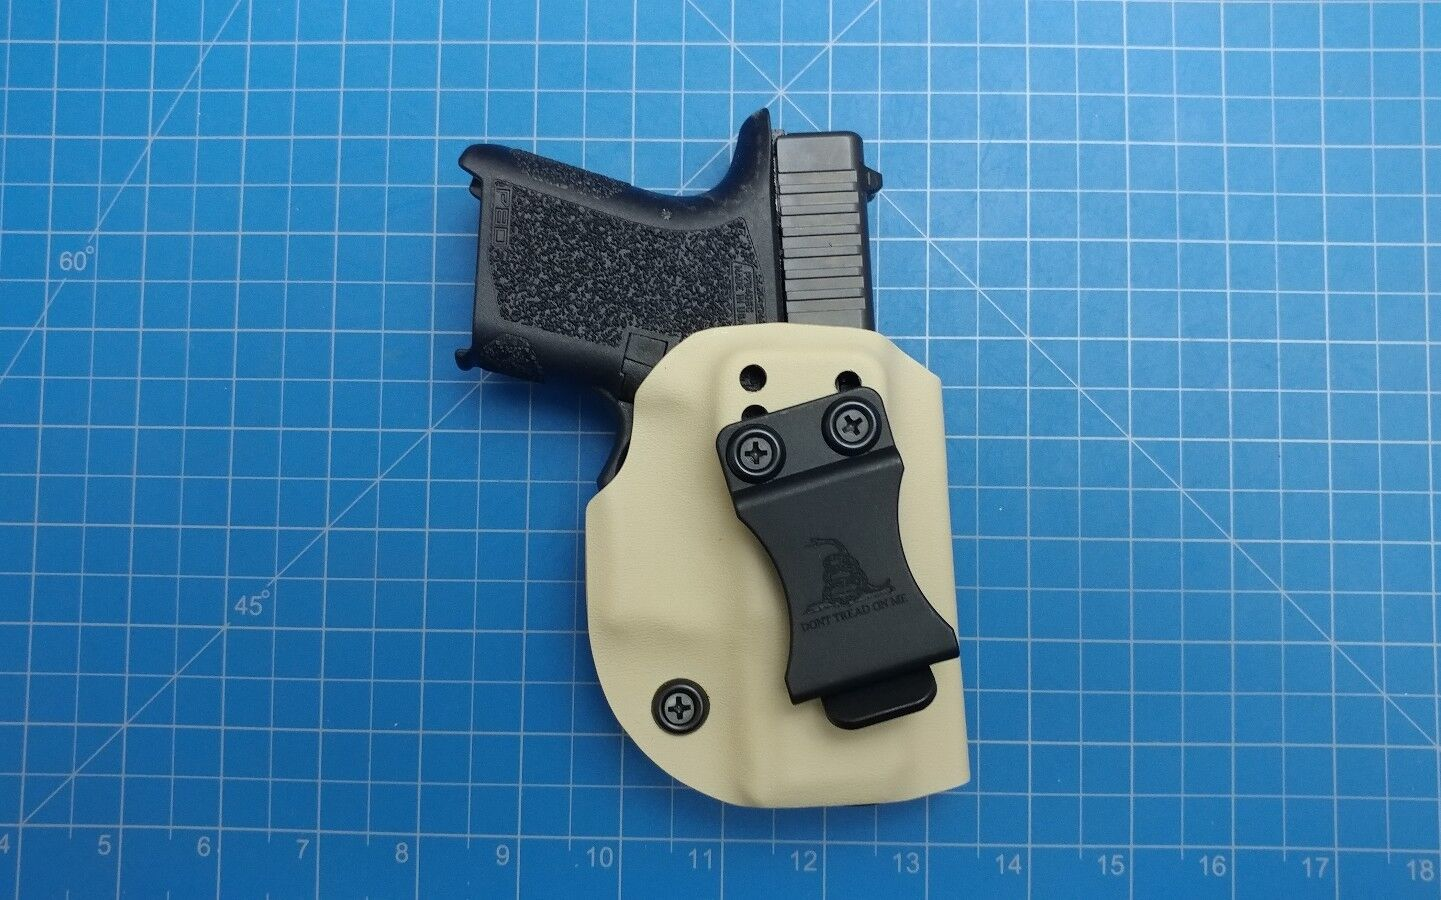 Polymer 80 pf940sc iwb right hand carry kydex holster desert tan